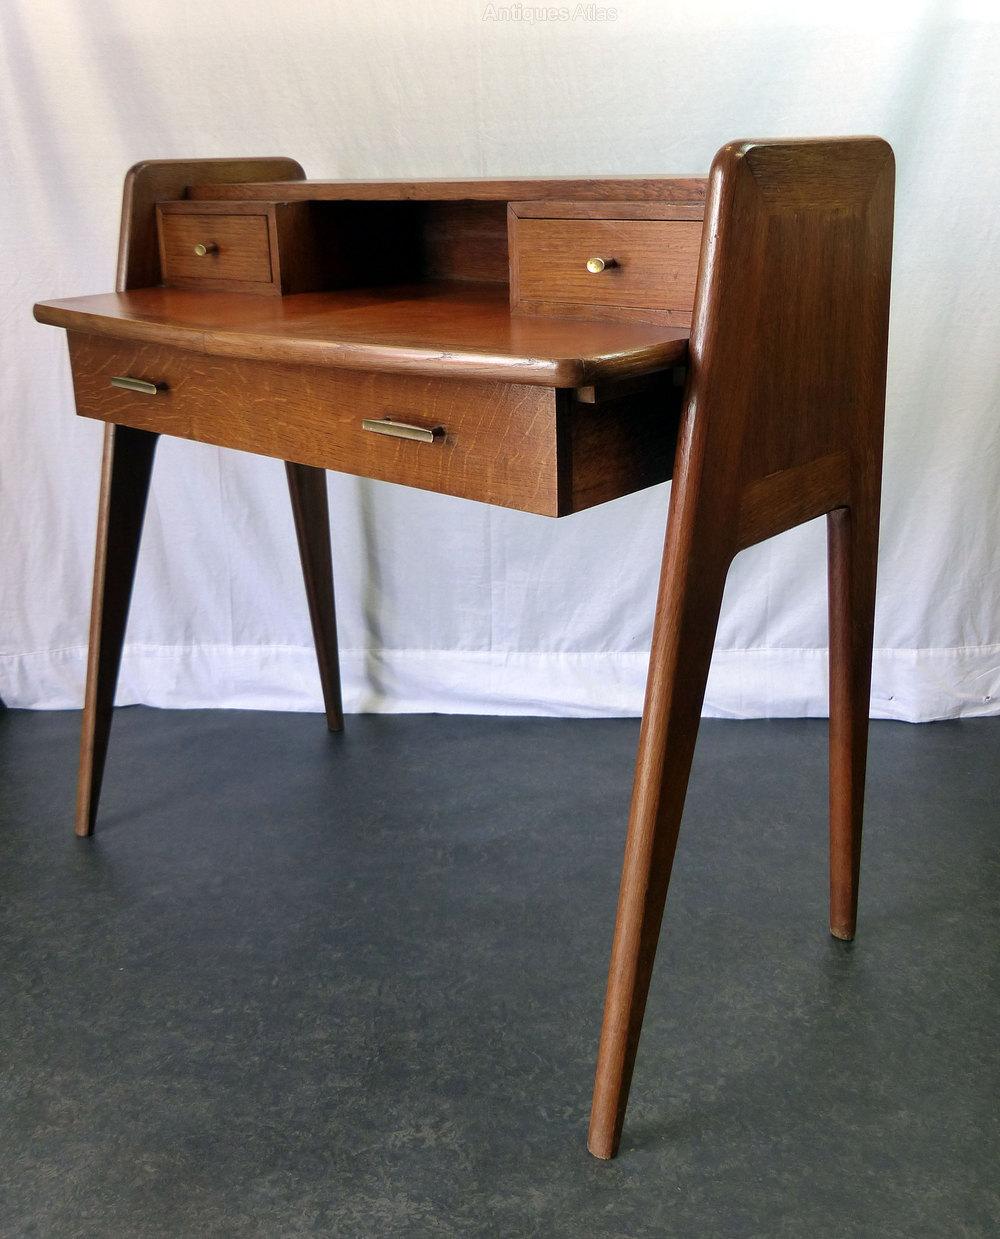 Antiques atlas vintage italian desk or dressing table for Retro dressing table